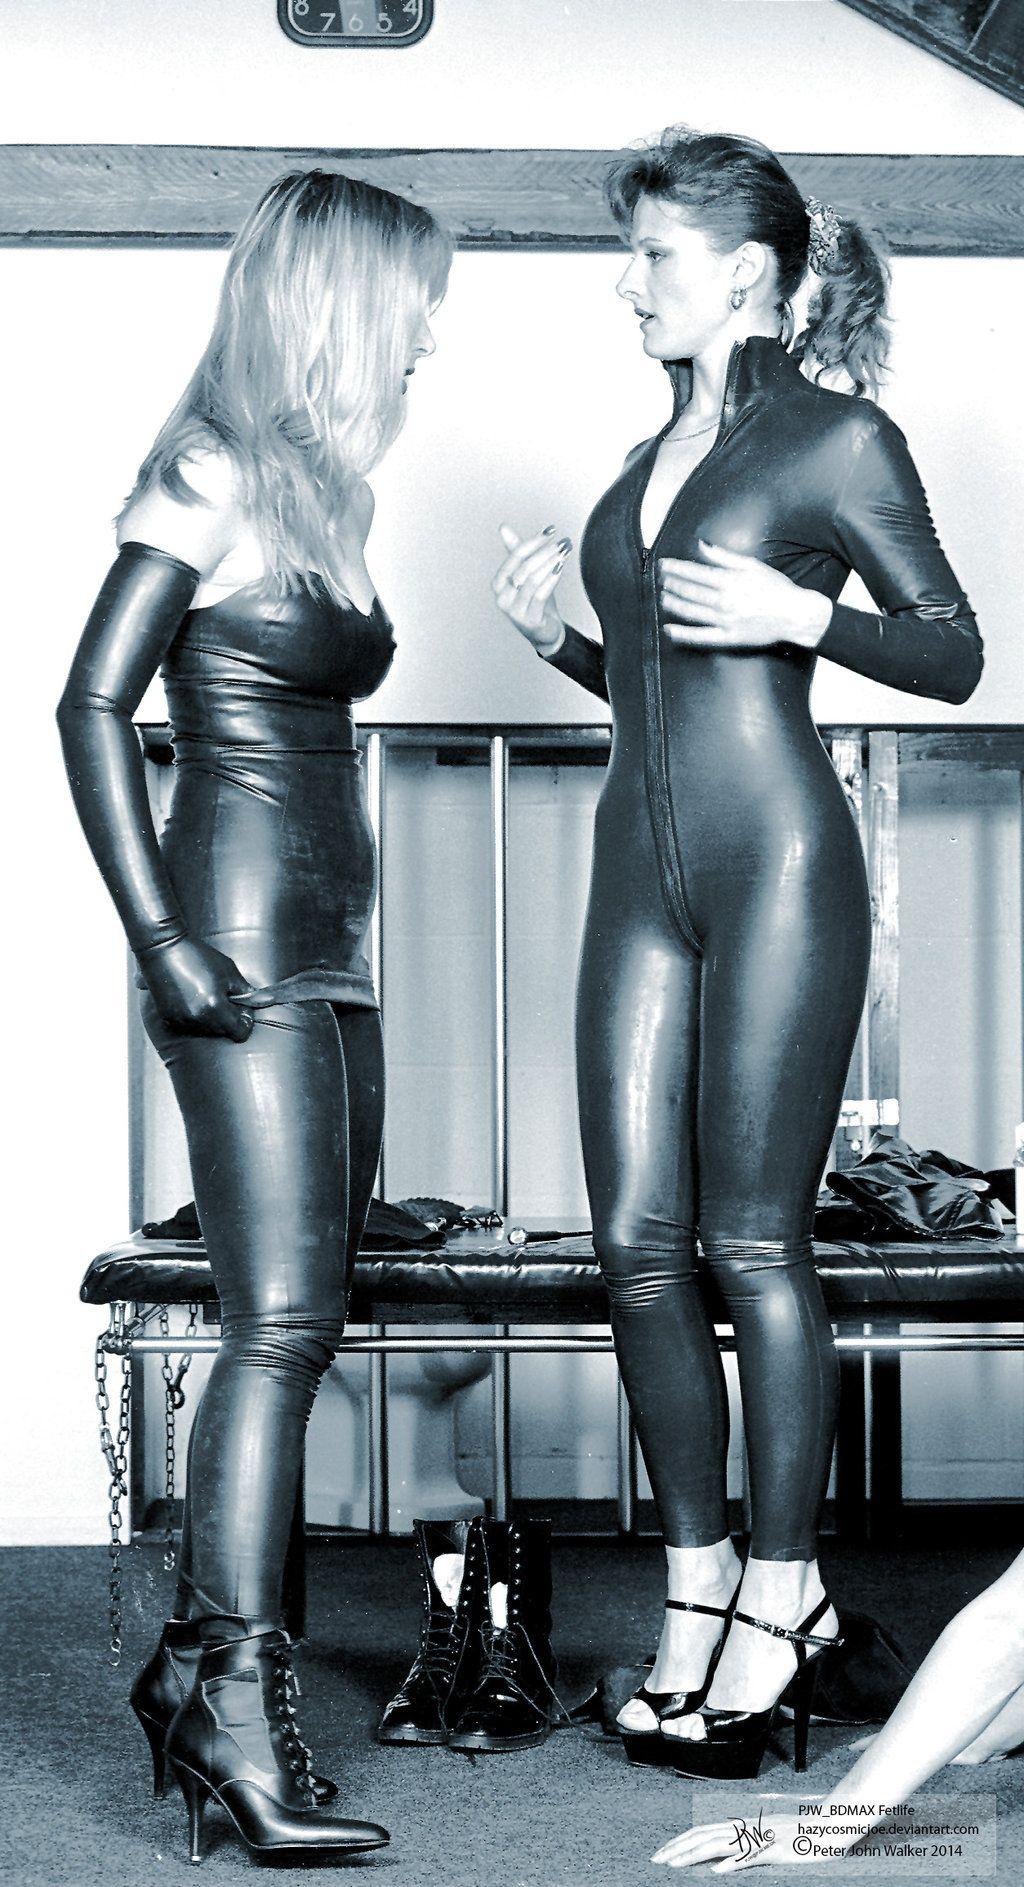 Kerry matthews as mistress caroline - 2 part 2